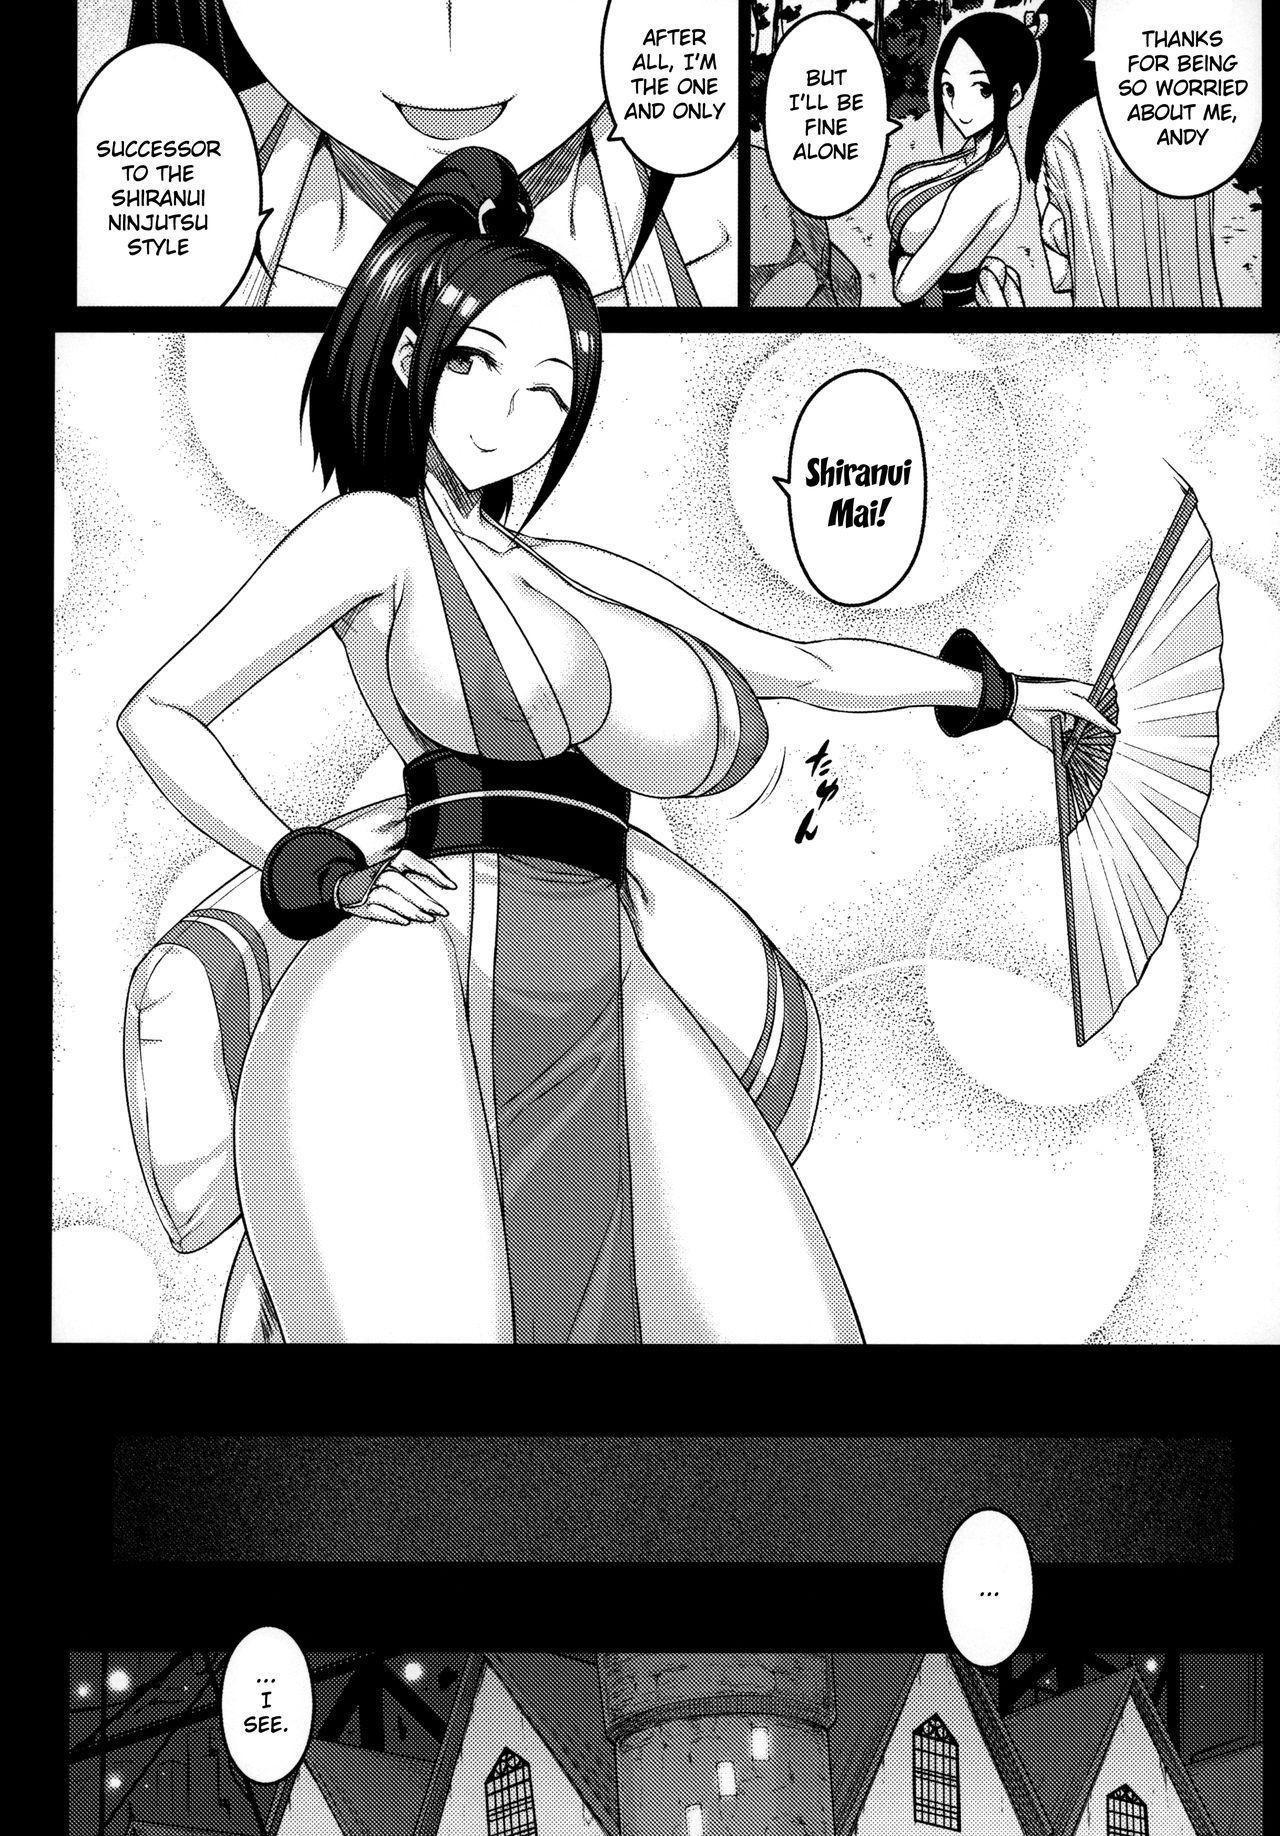 Daraku no hana   Flower of depravity 4